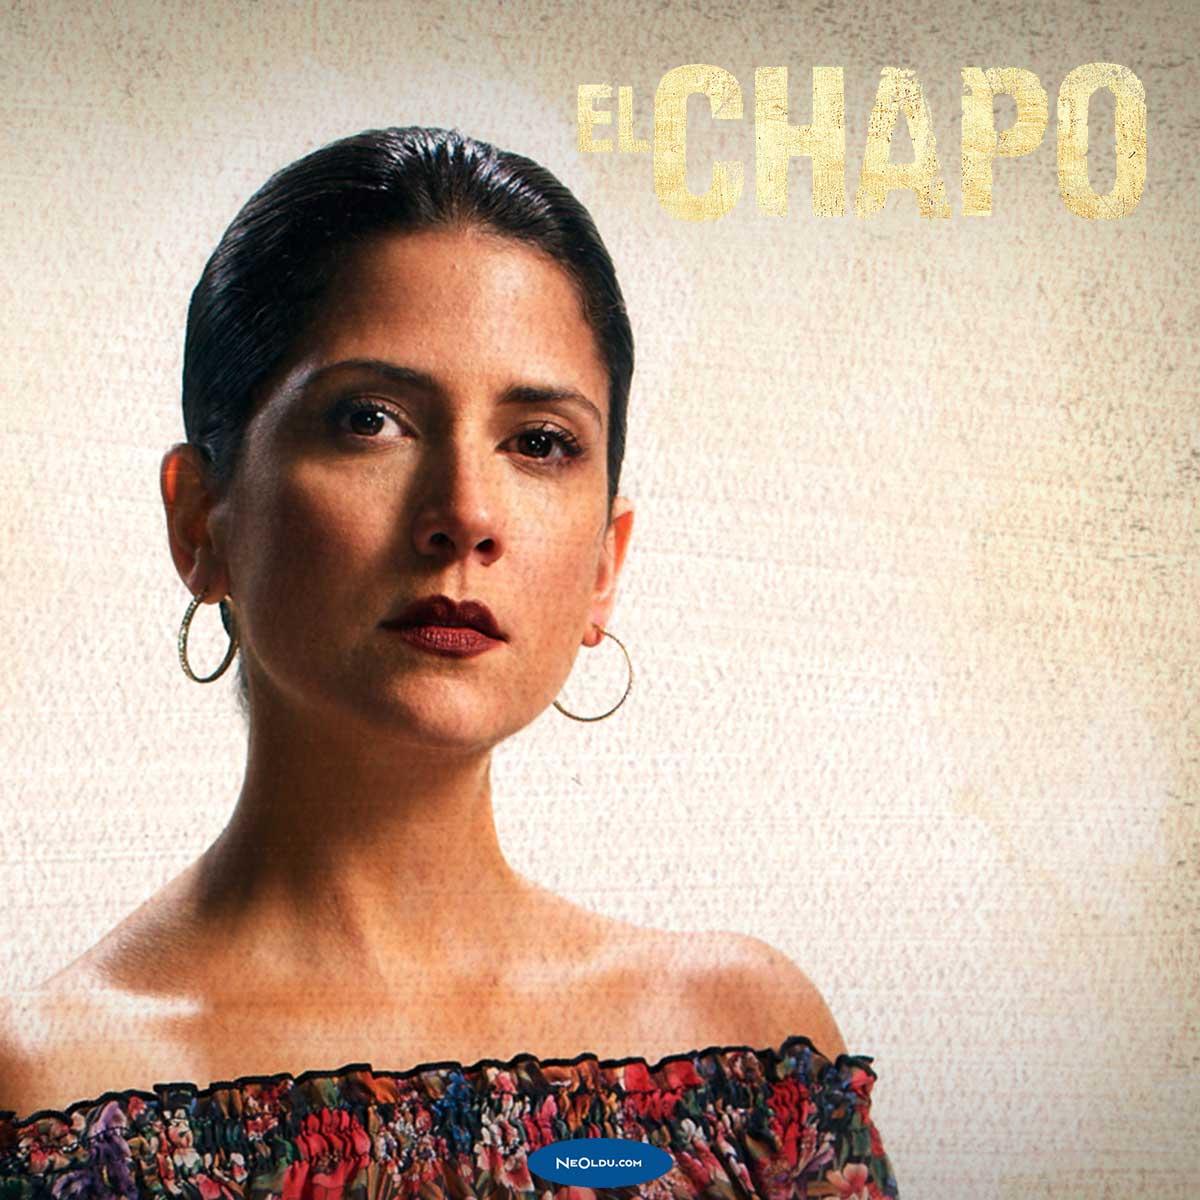 El Chapo Dizi İncelemesi